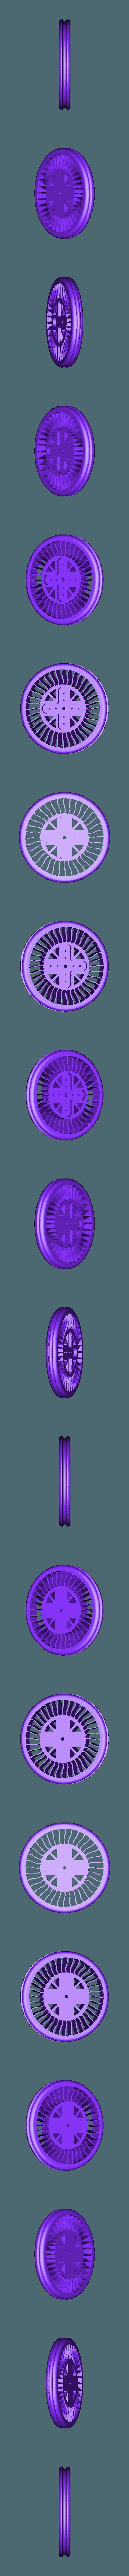 Rueda1.STL Download free STL file Rueda Para Servo • 3D printer object, Obenottr3D